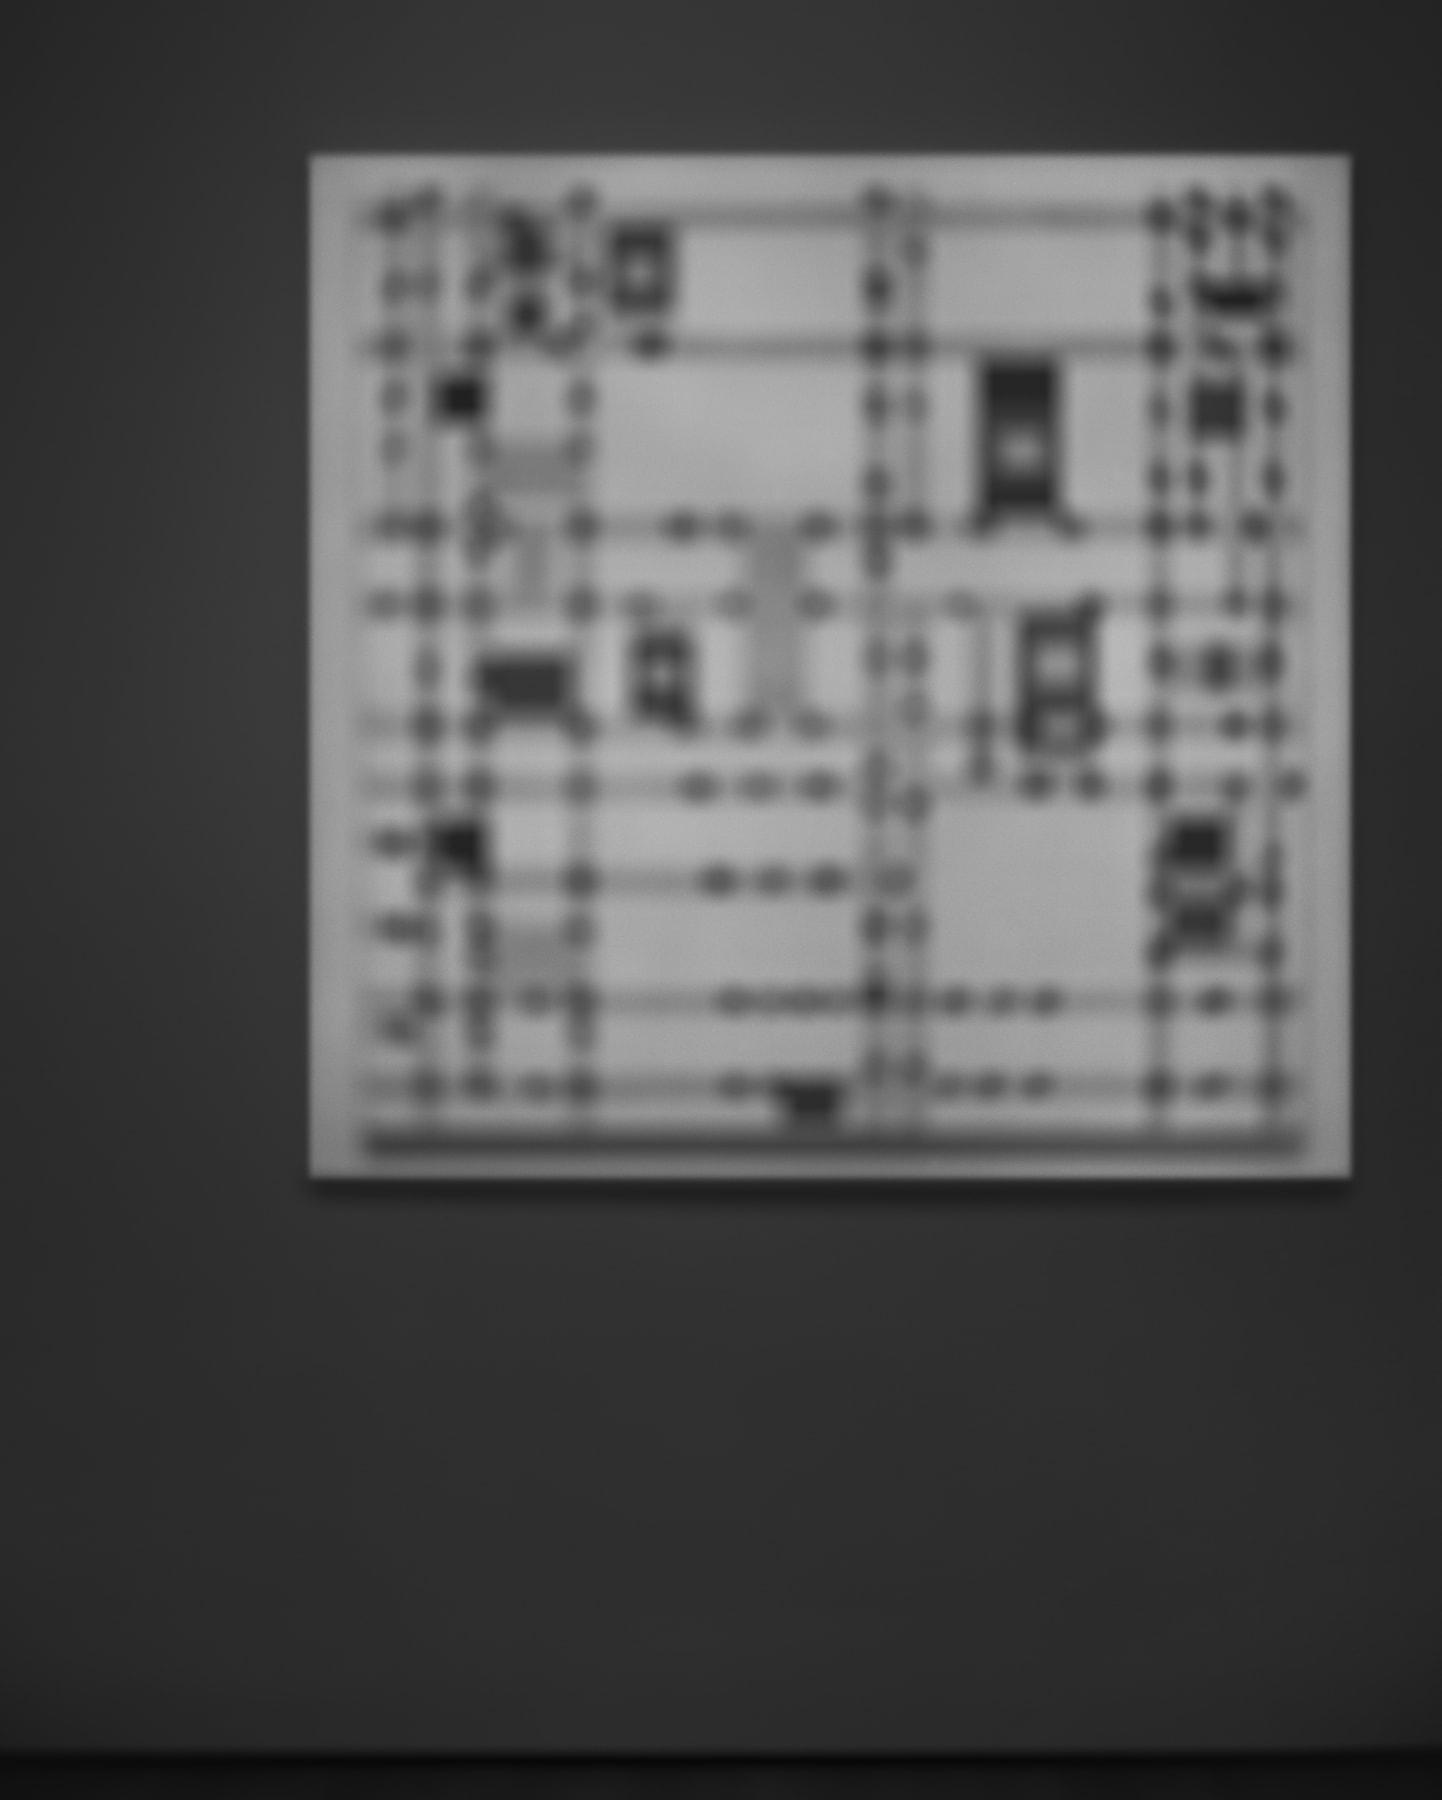 Hiroshi Sugimoto, Past Presence 041, Broadway Boogie Woogie, Piet Mondrian, 2014